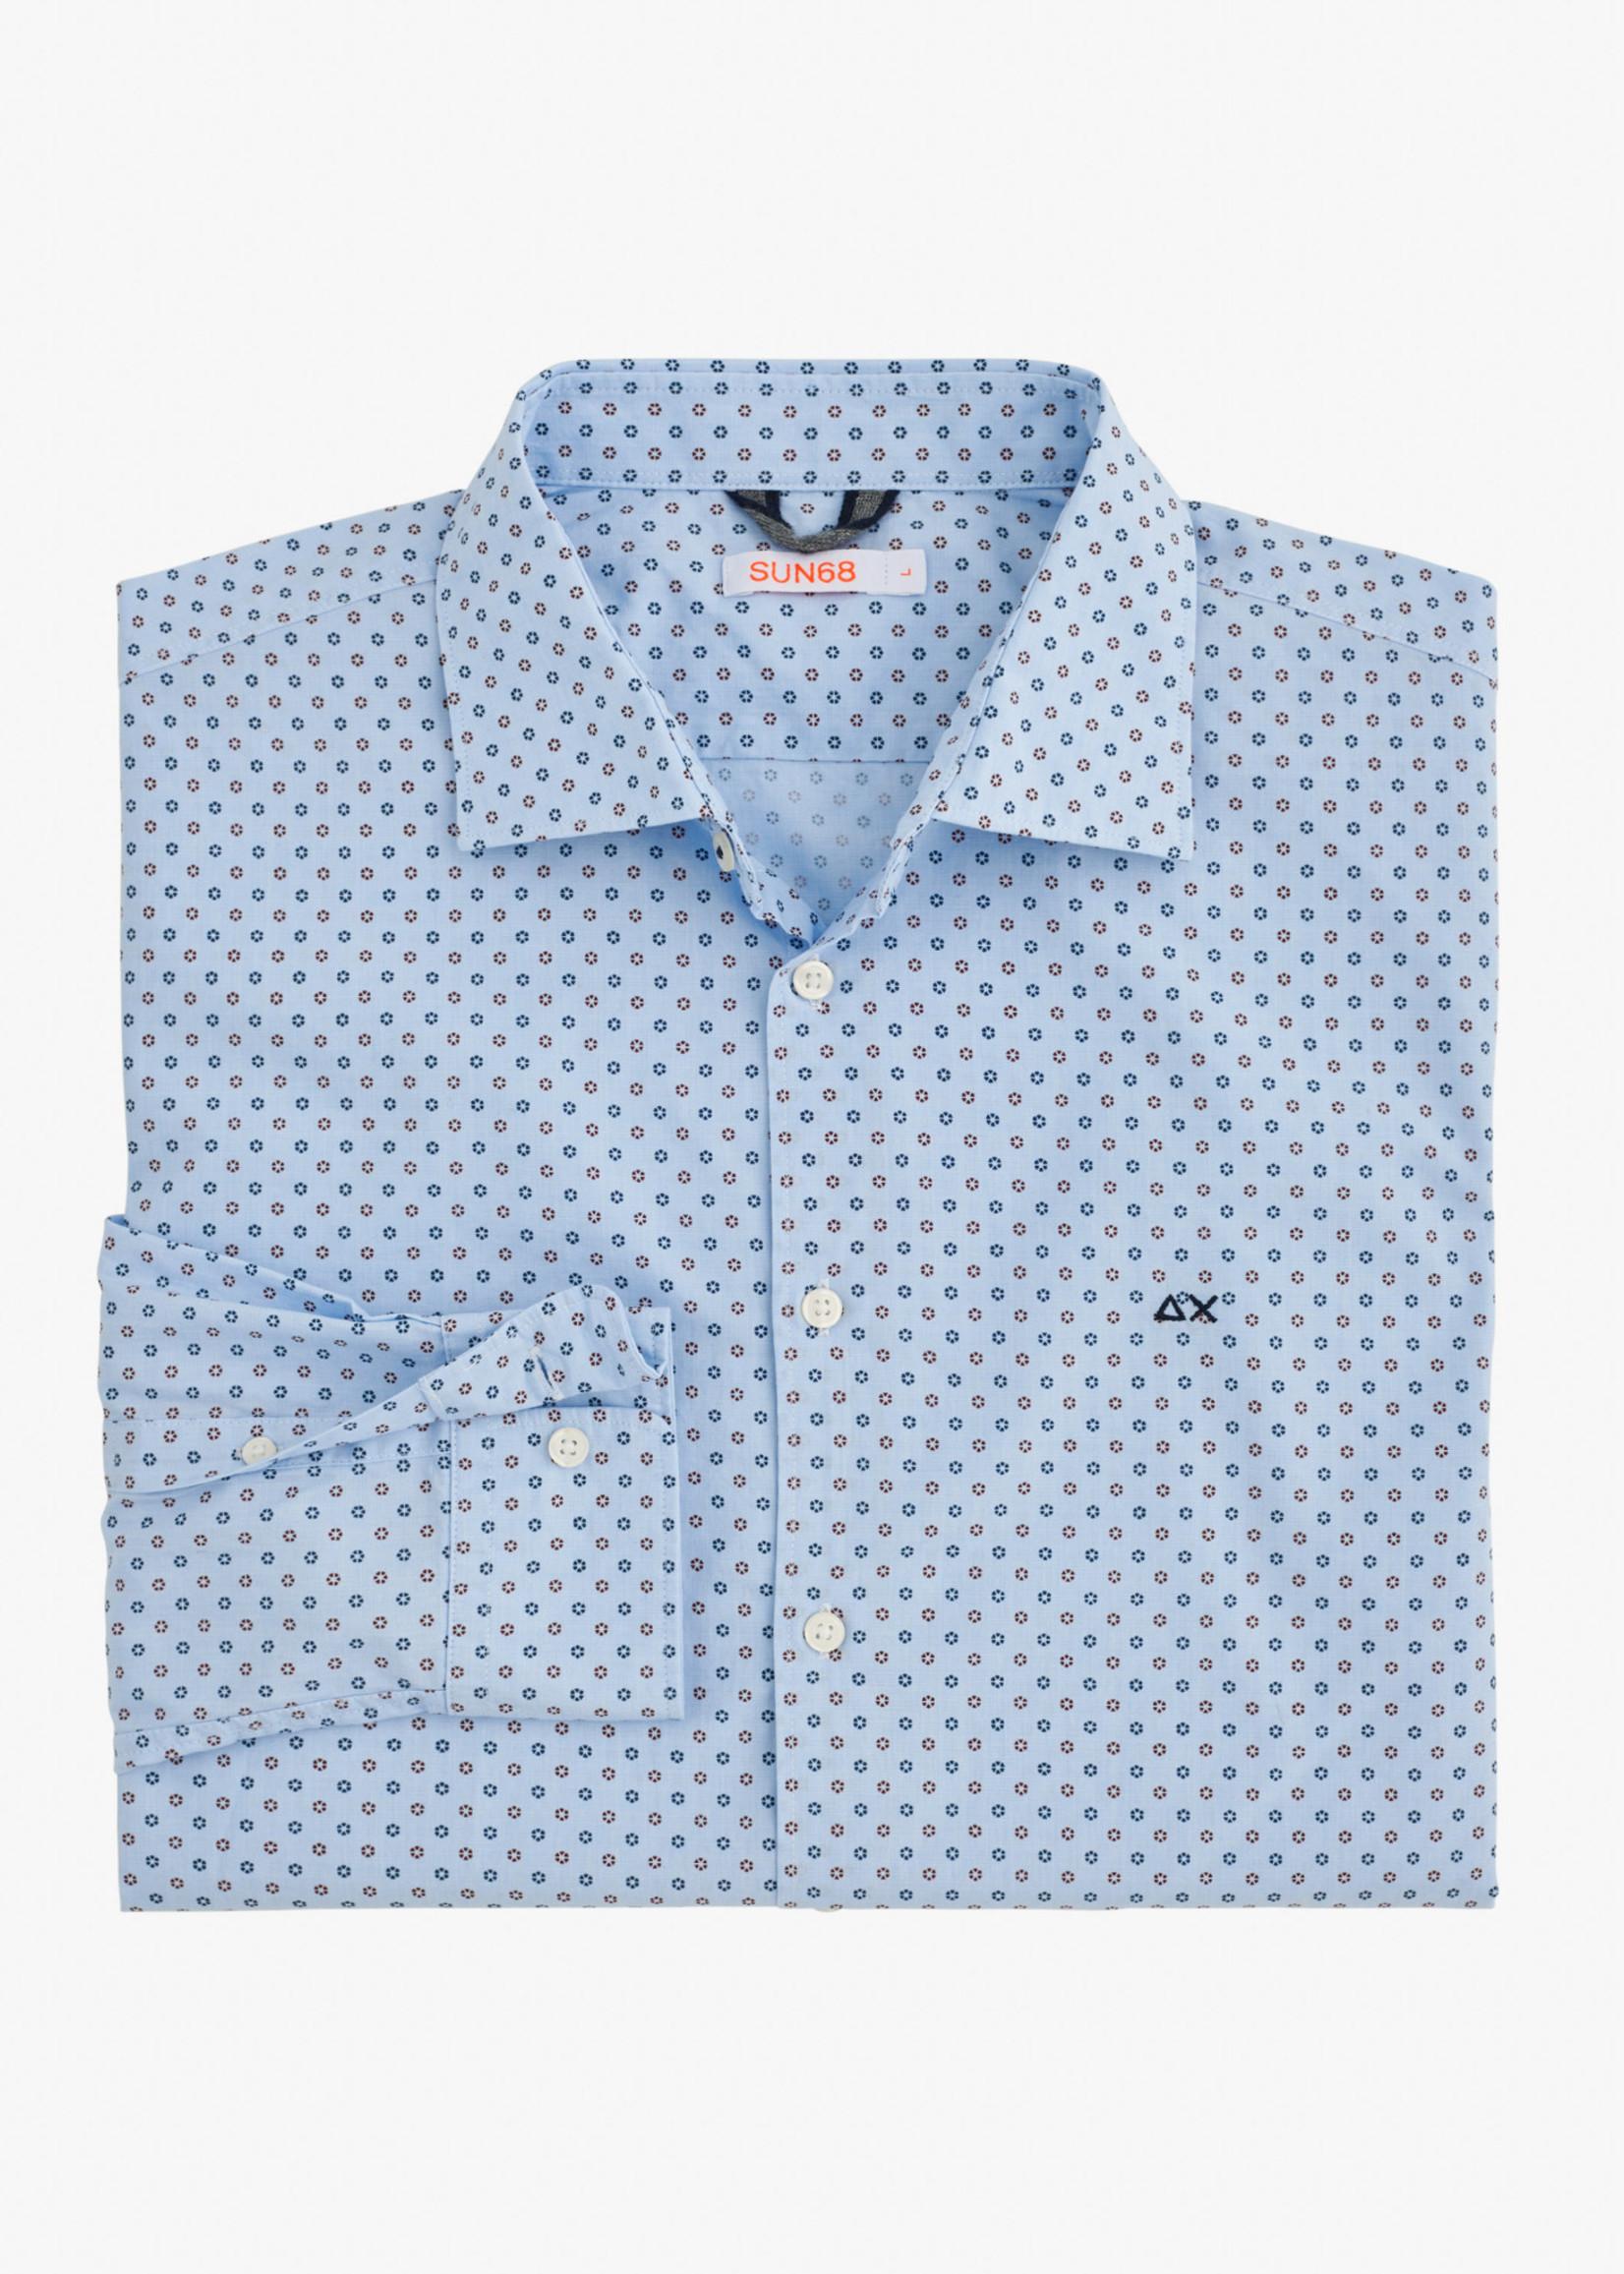 SUN68 Shirt Details French Collar L/S | Bleu/Rouge | SUN68